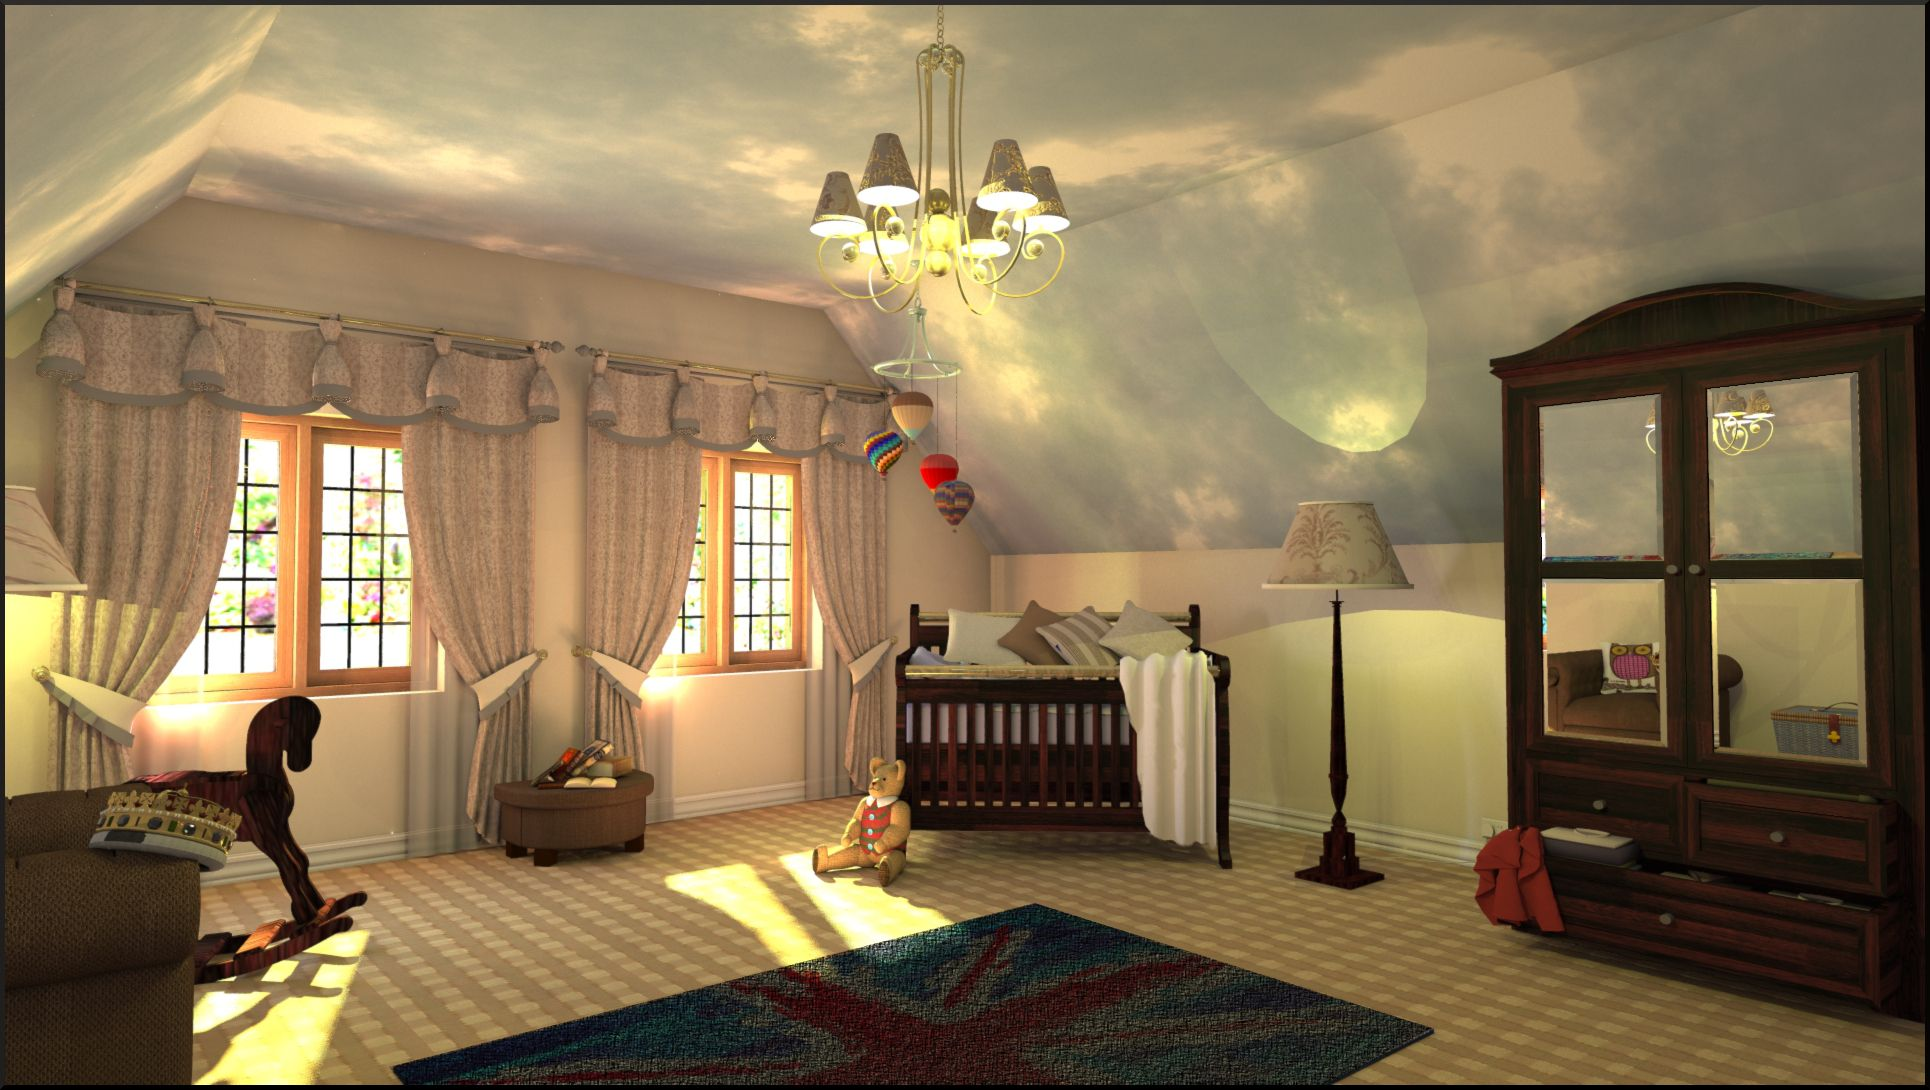 Inviting Lighting Google Search Interior Design Games Beautiful Bathroom Designs Home Interior Design